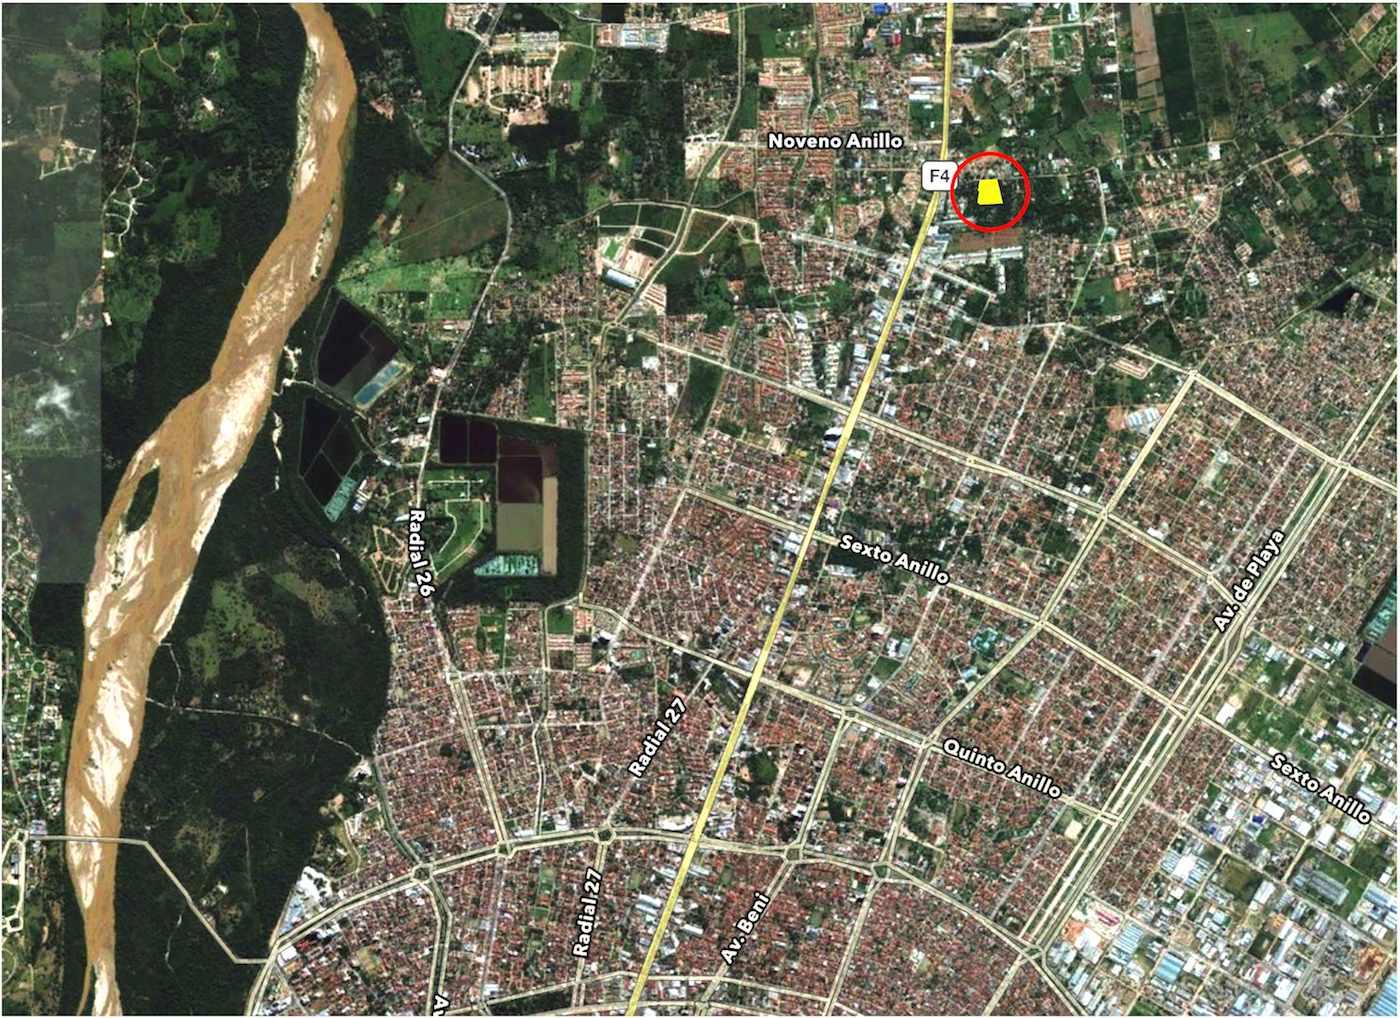 Terreno en Venta Av. Banzer Km. 7-1/2 (entre 8° & 9° anillo)... a 250 mts de la carretera Foto 3